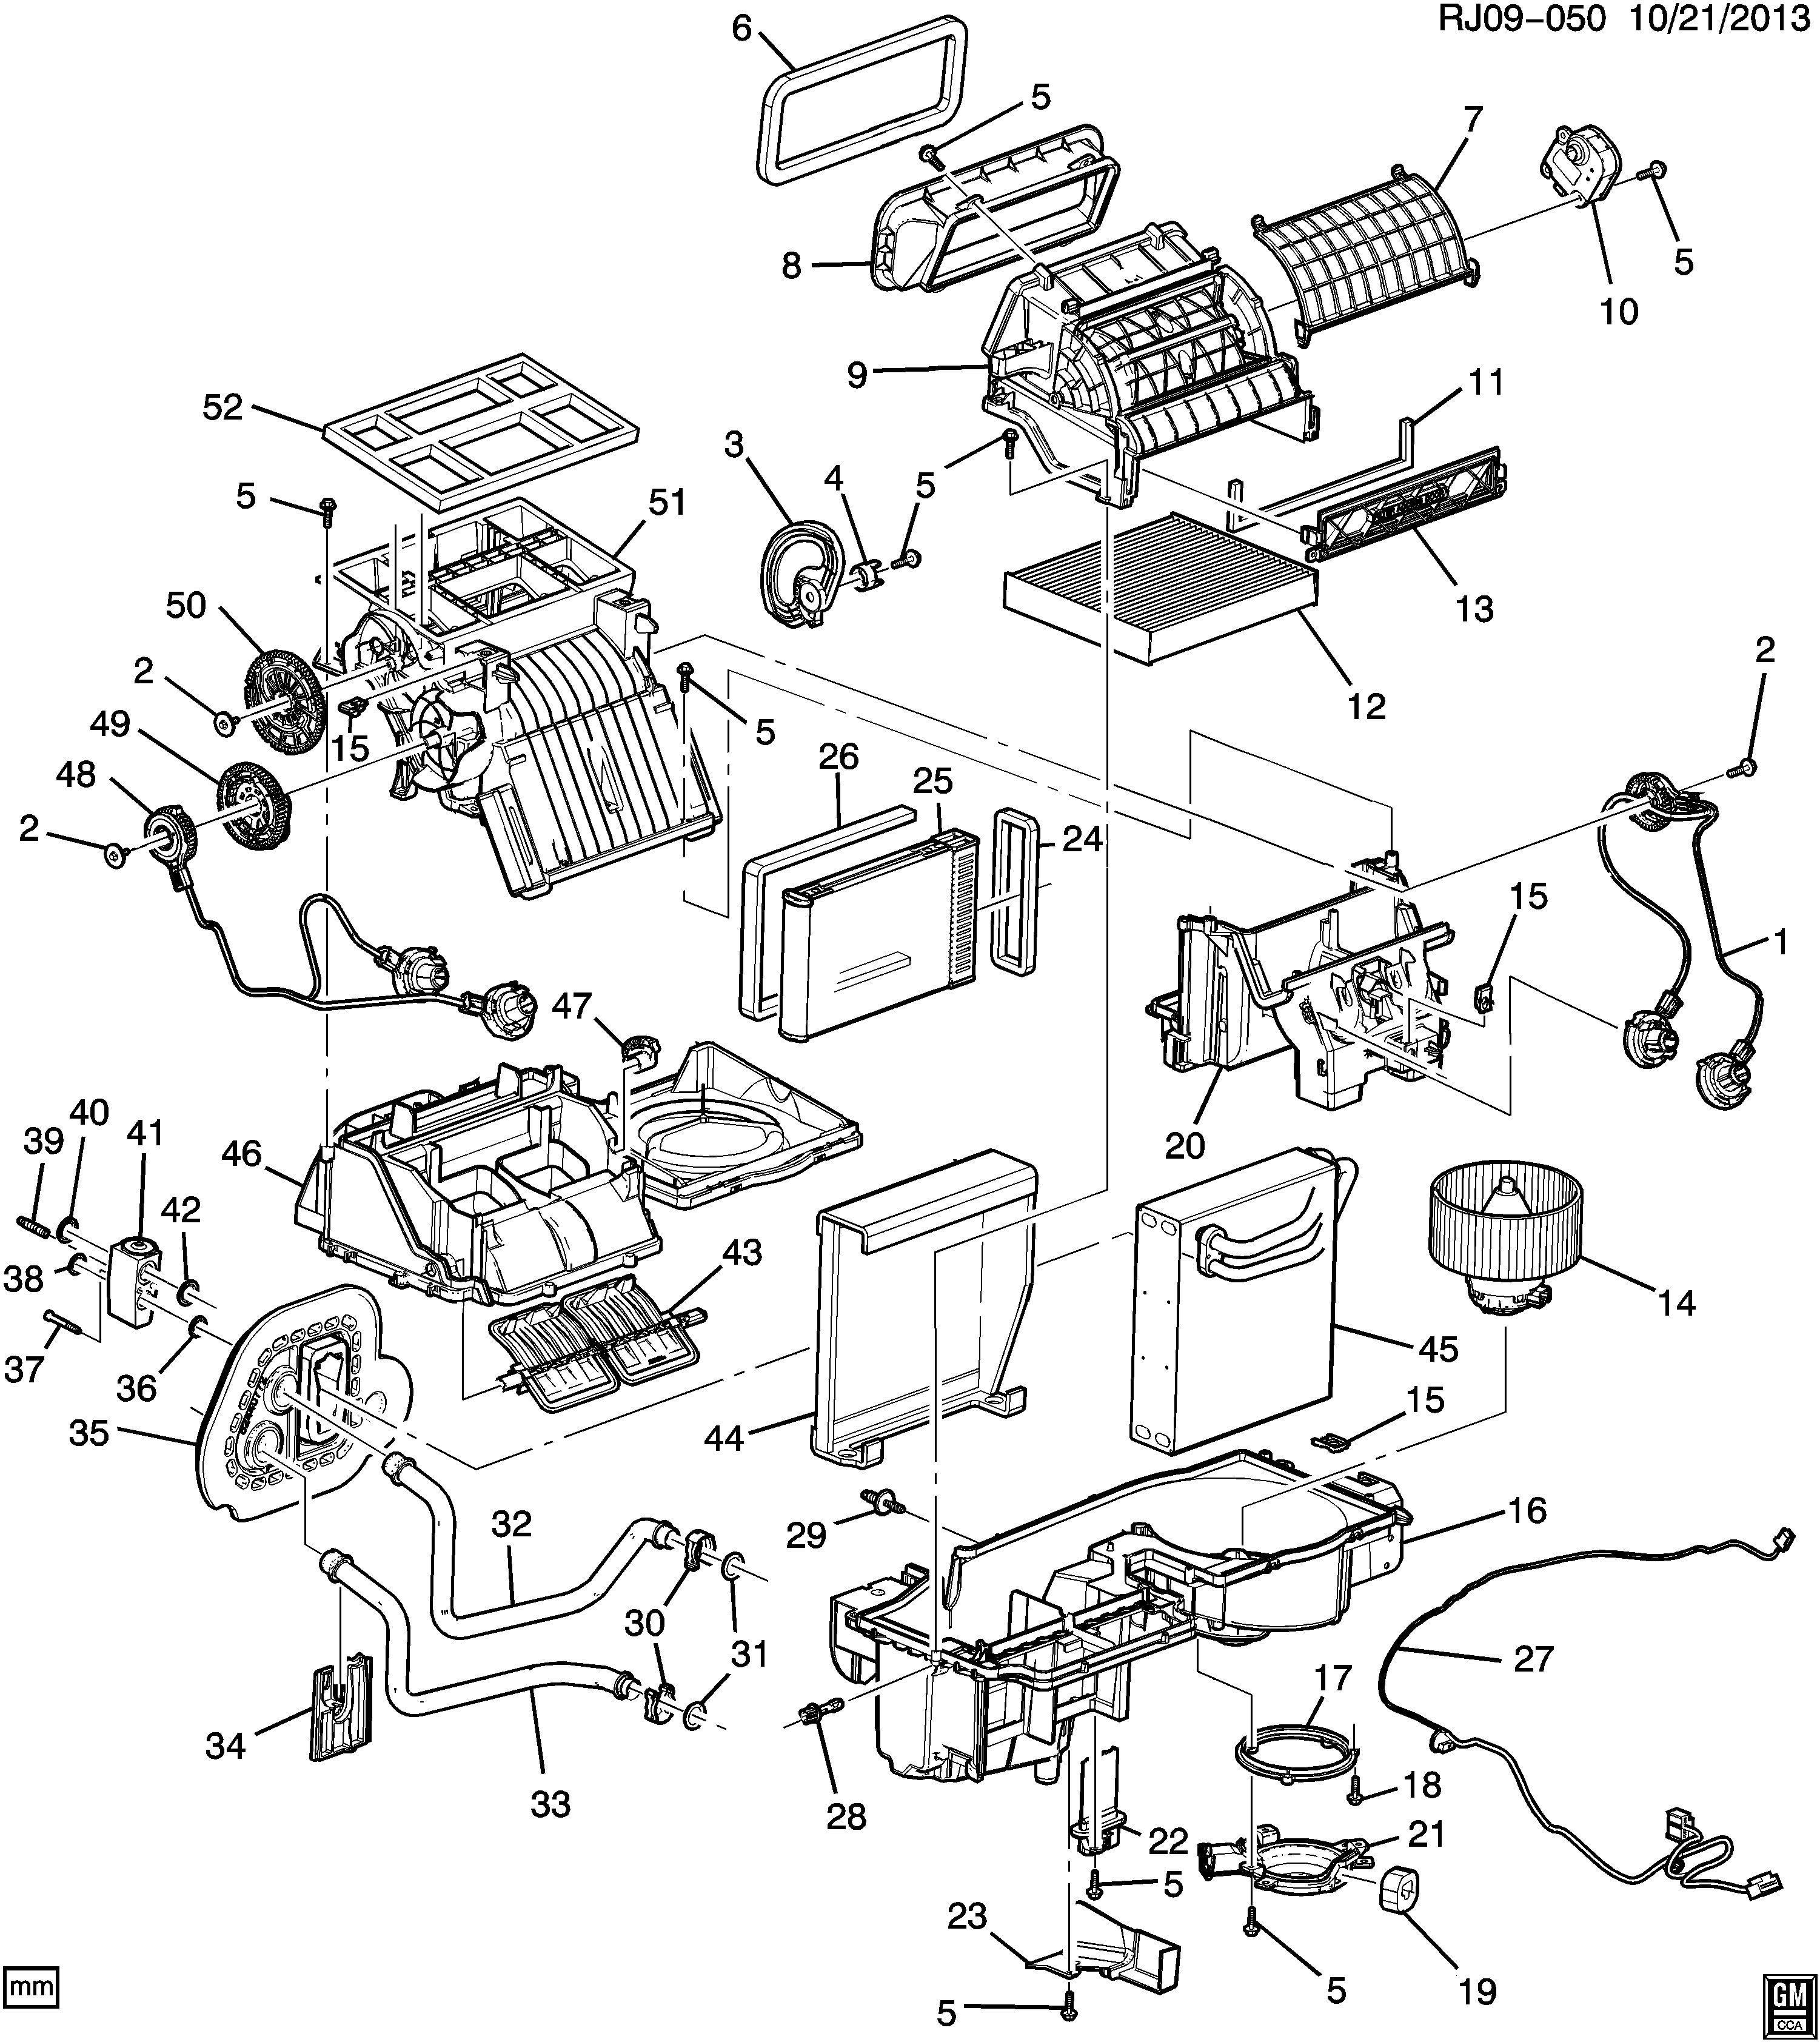 Chevrolet Trax A/C & HEATER MODULE ASM